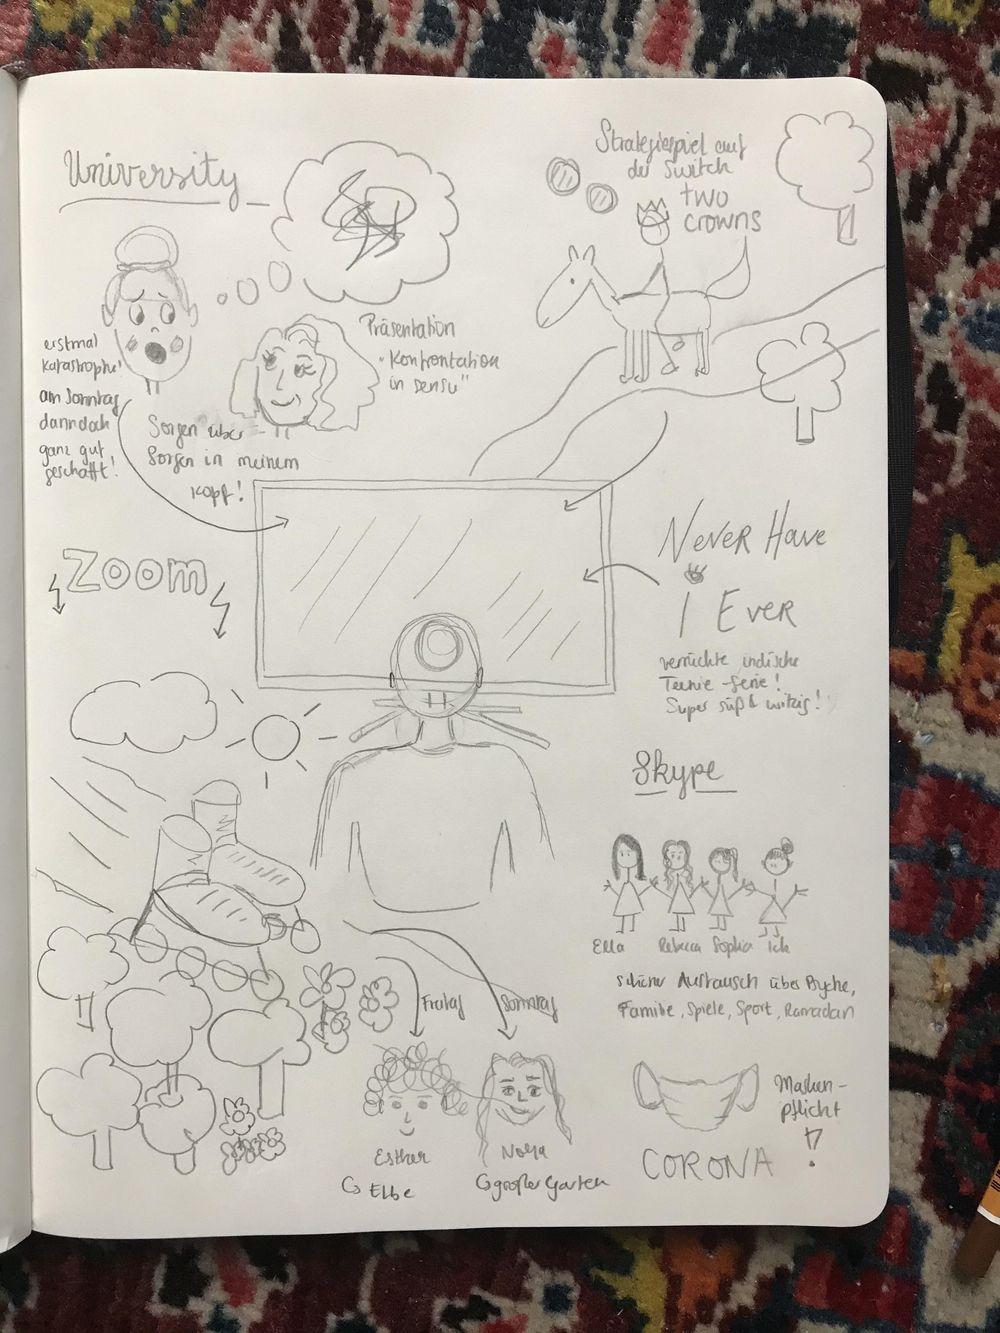 Sketch of Journal Illustration - image 2 - student project